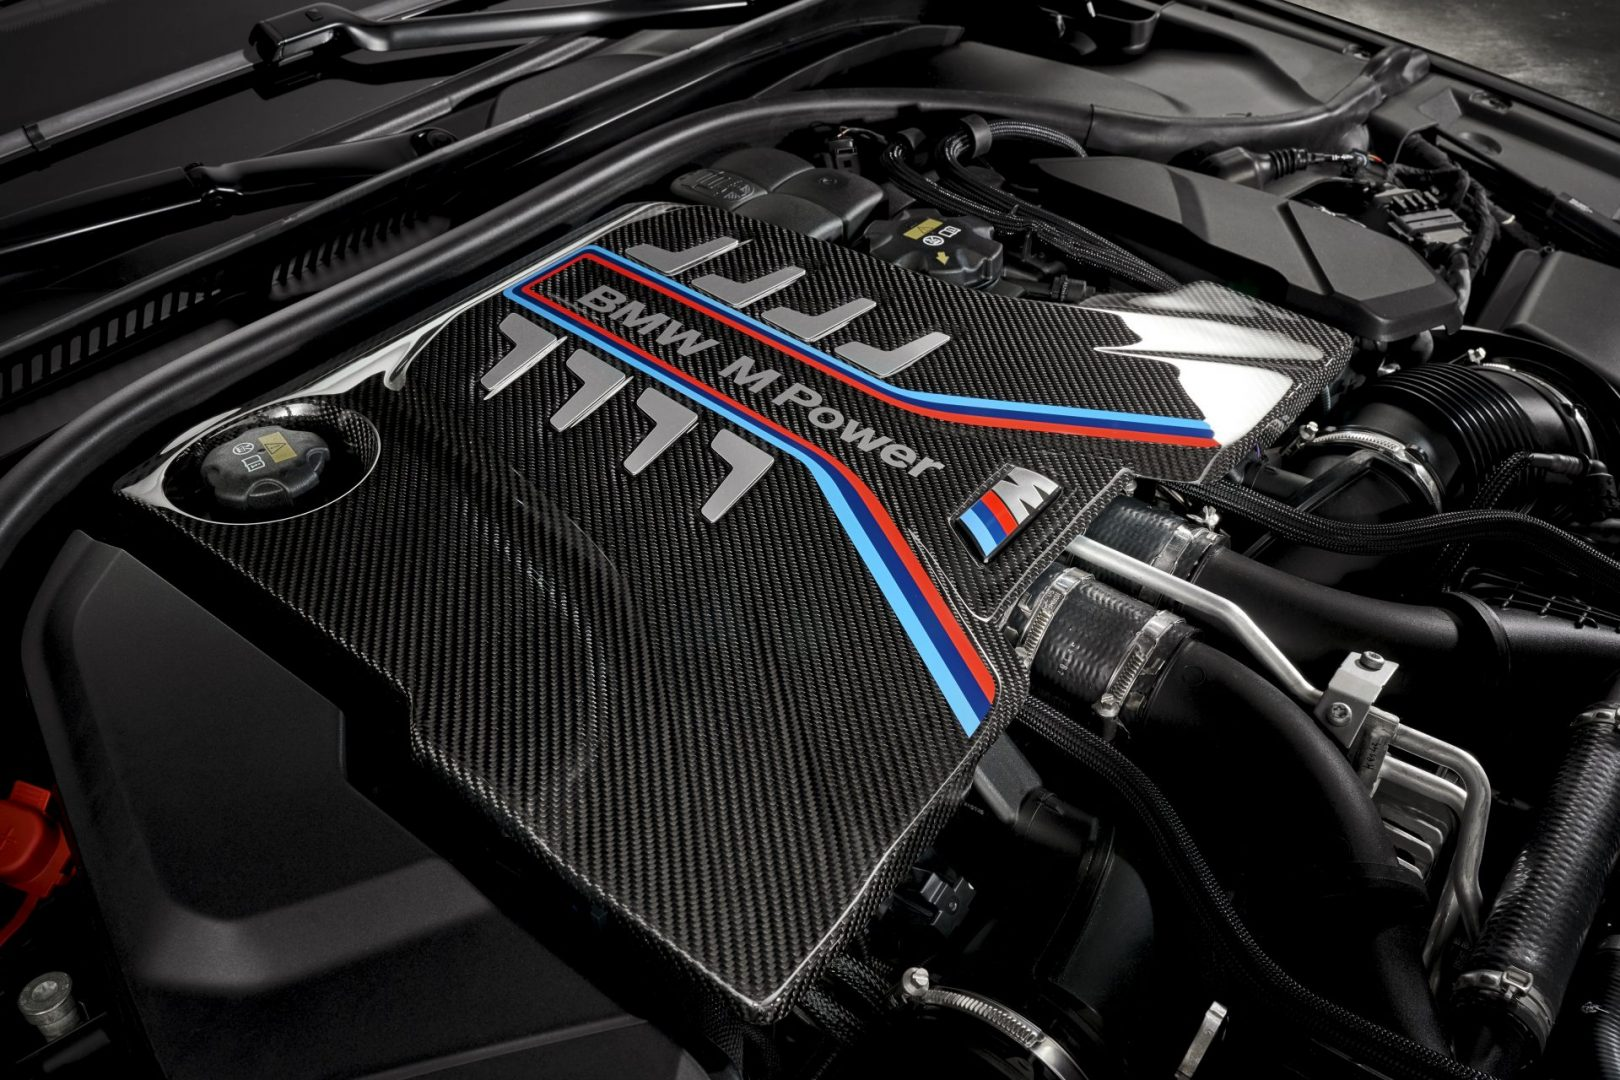 BMW M5 CS motor